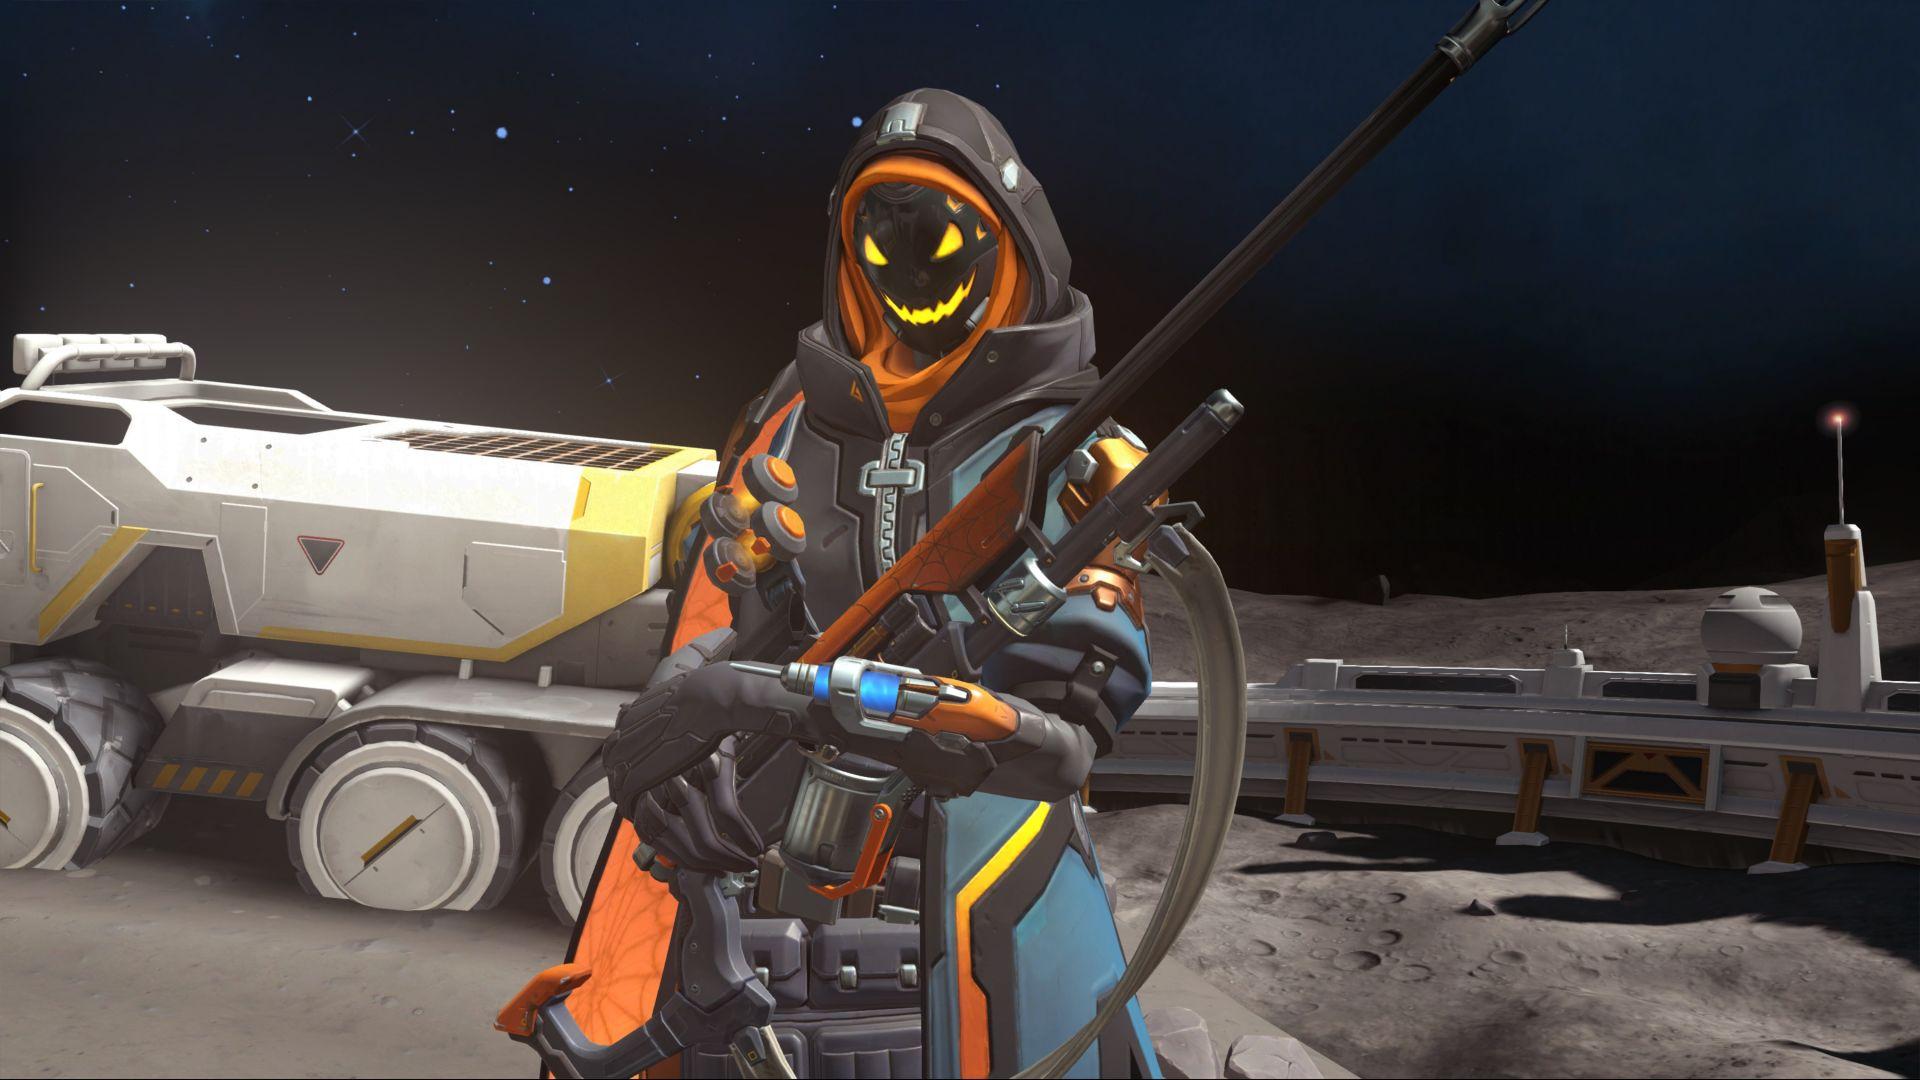 Wallpaper Ana, online game, overwatch, gun, 4k